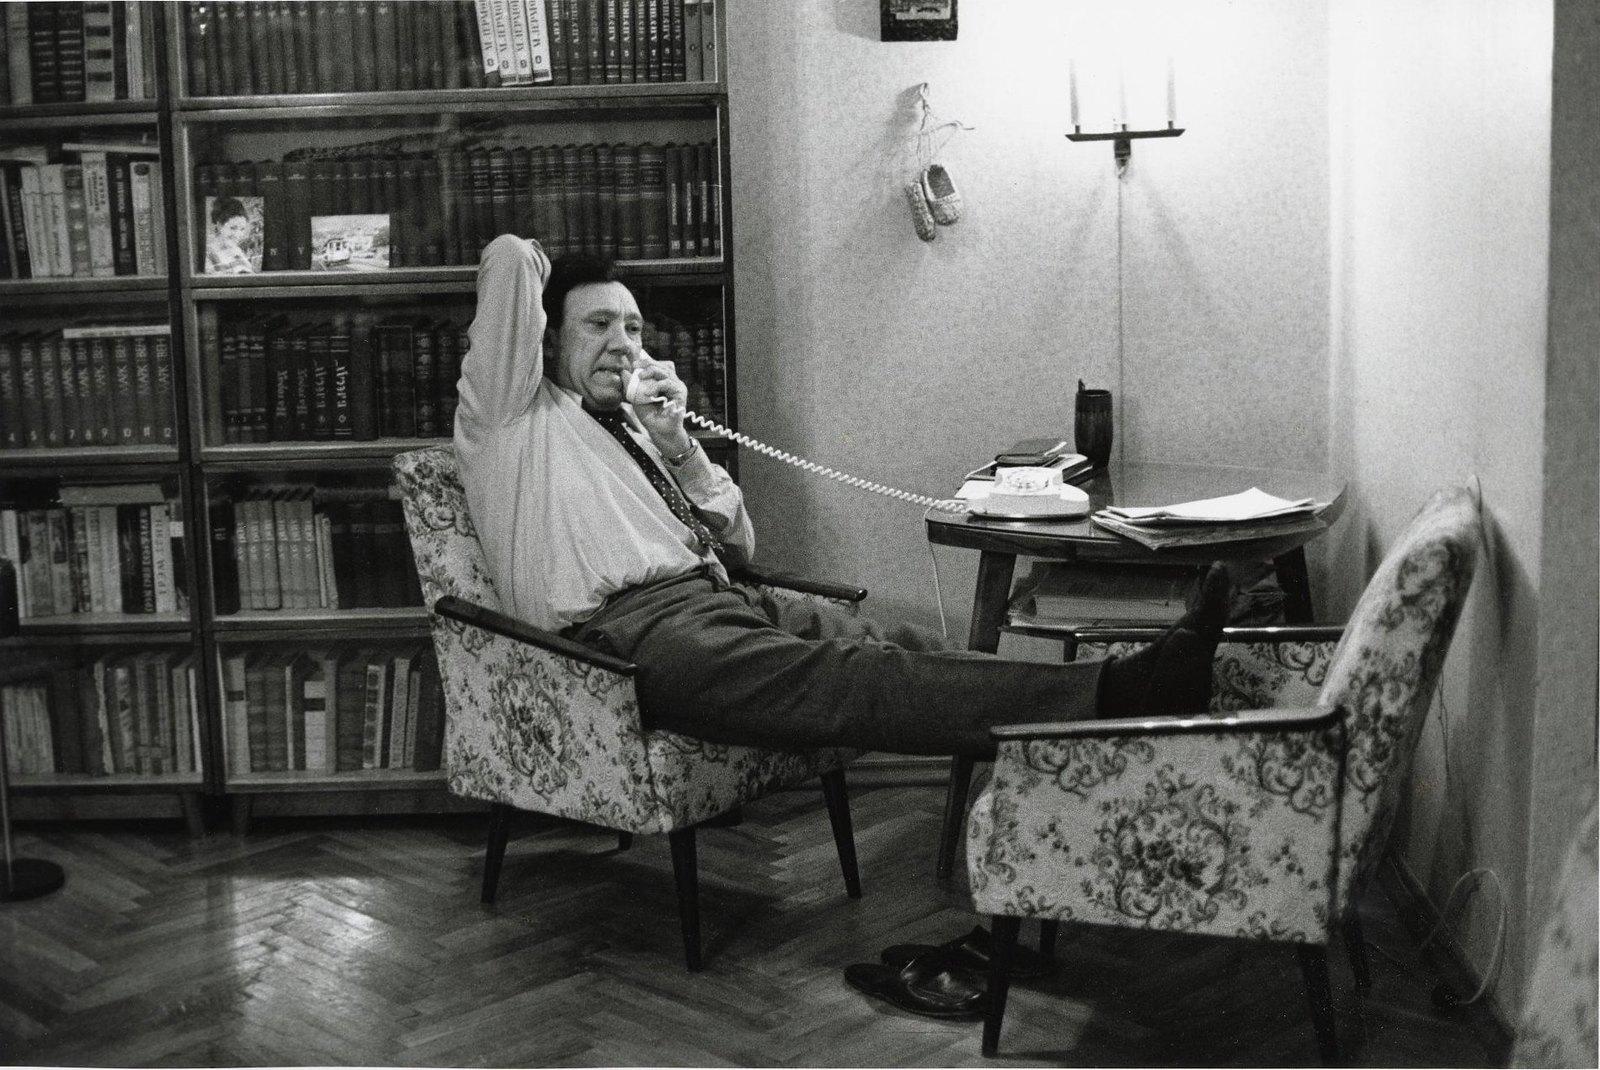 1971. Юрий Никулин у себя дома